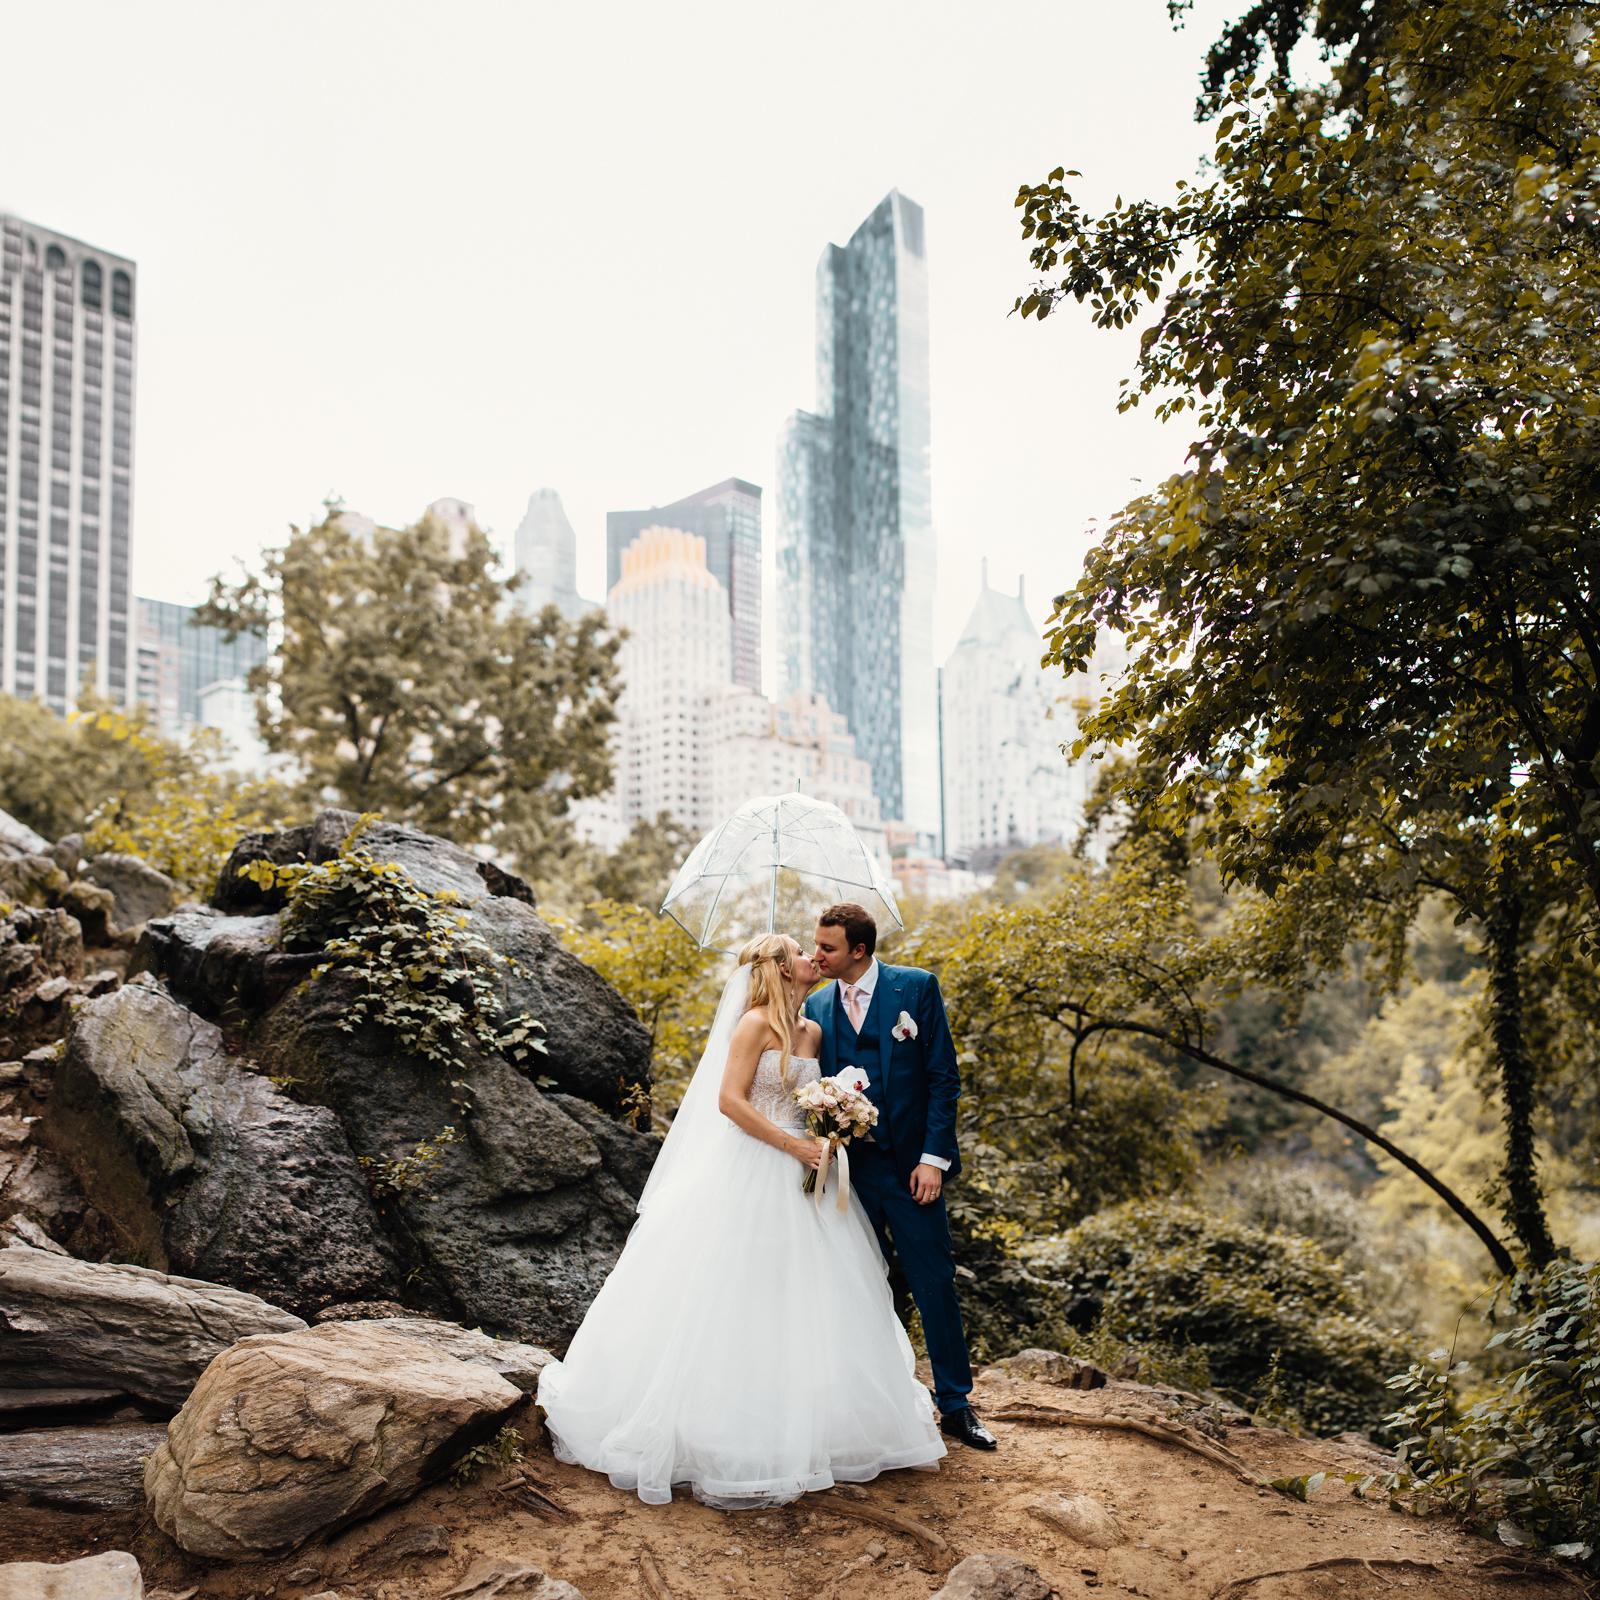 NYC Wedding Photography Sofitel Central Park Brooklyn Photographer Boris Zaretsky _B2C2564-Edit.jpg